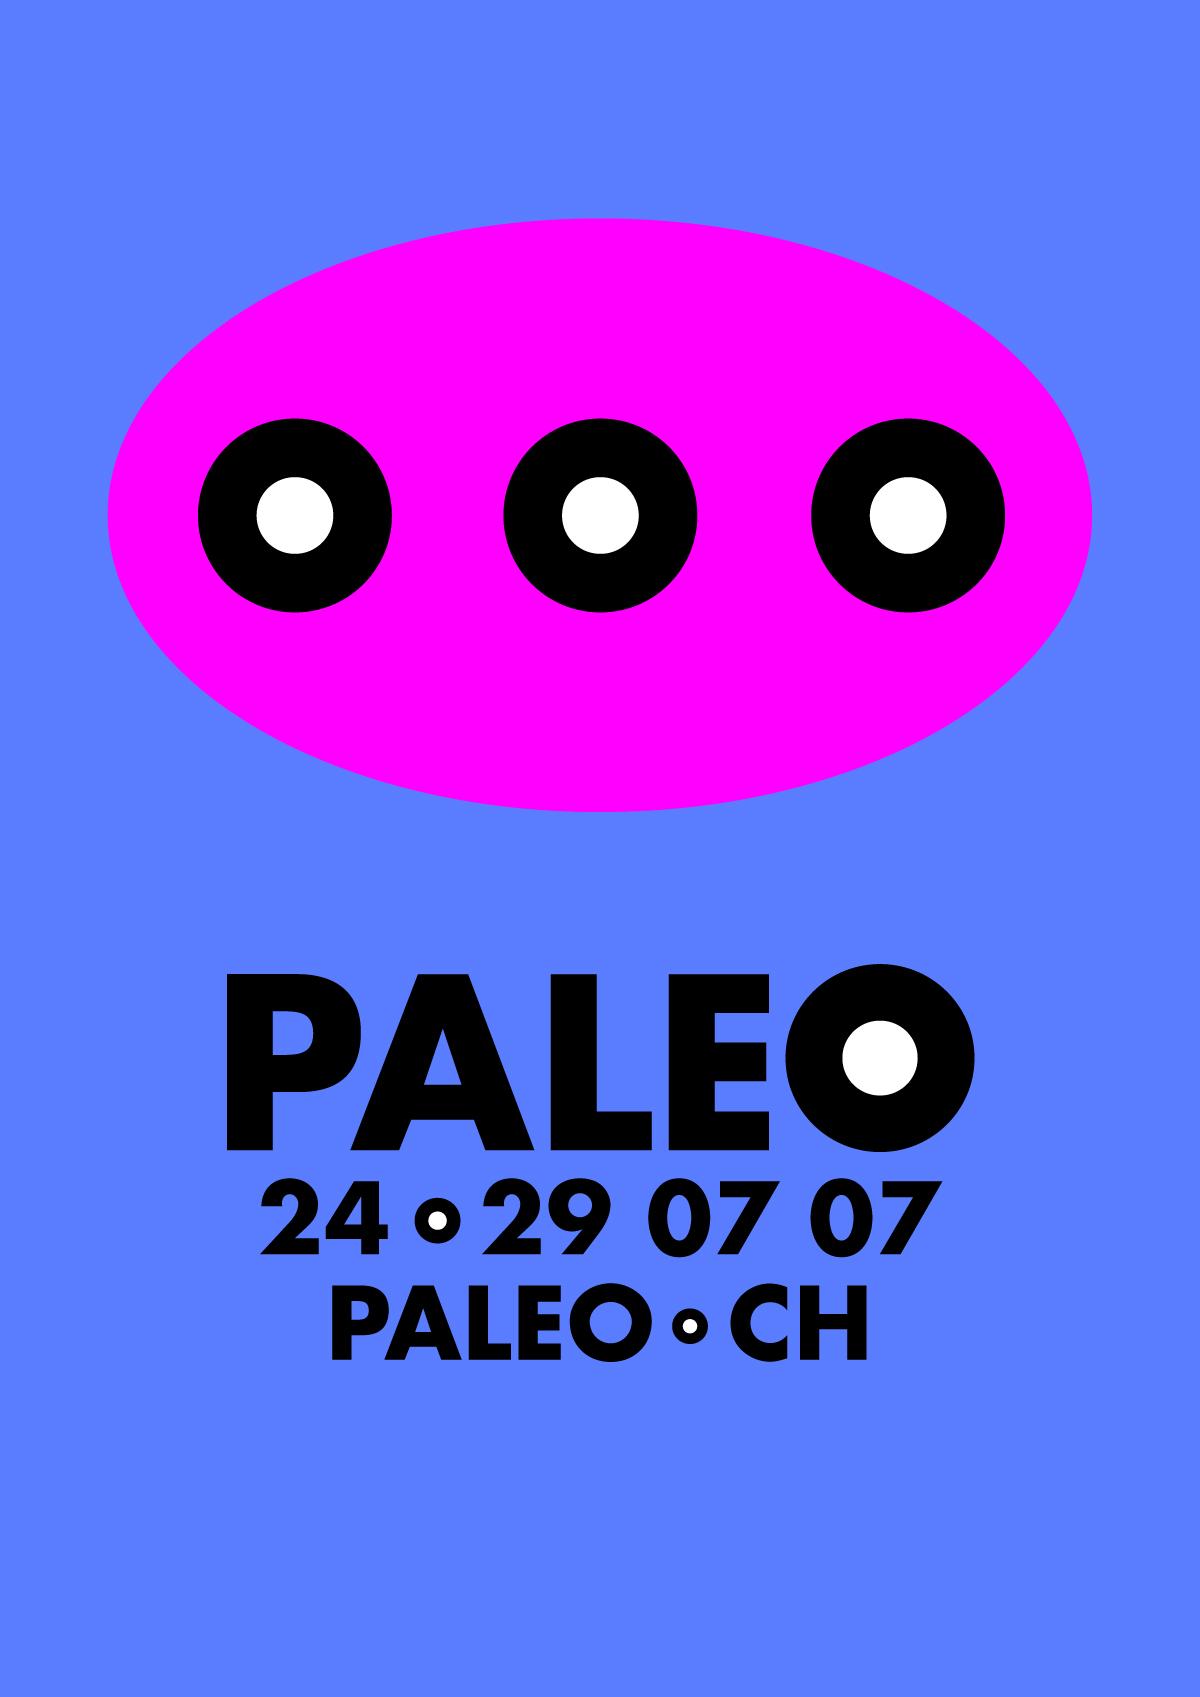 Paleo Festival de Nyon - 2007